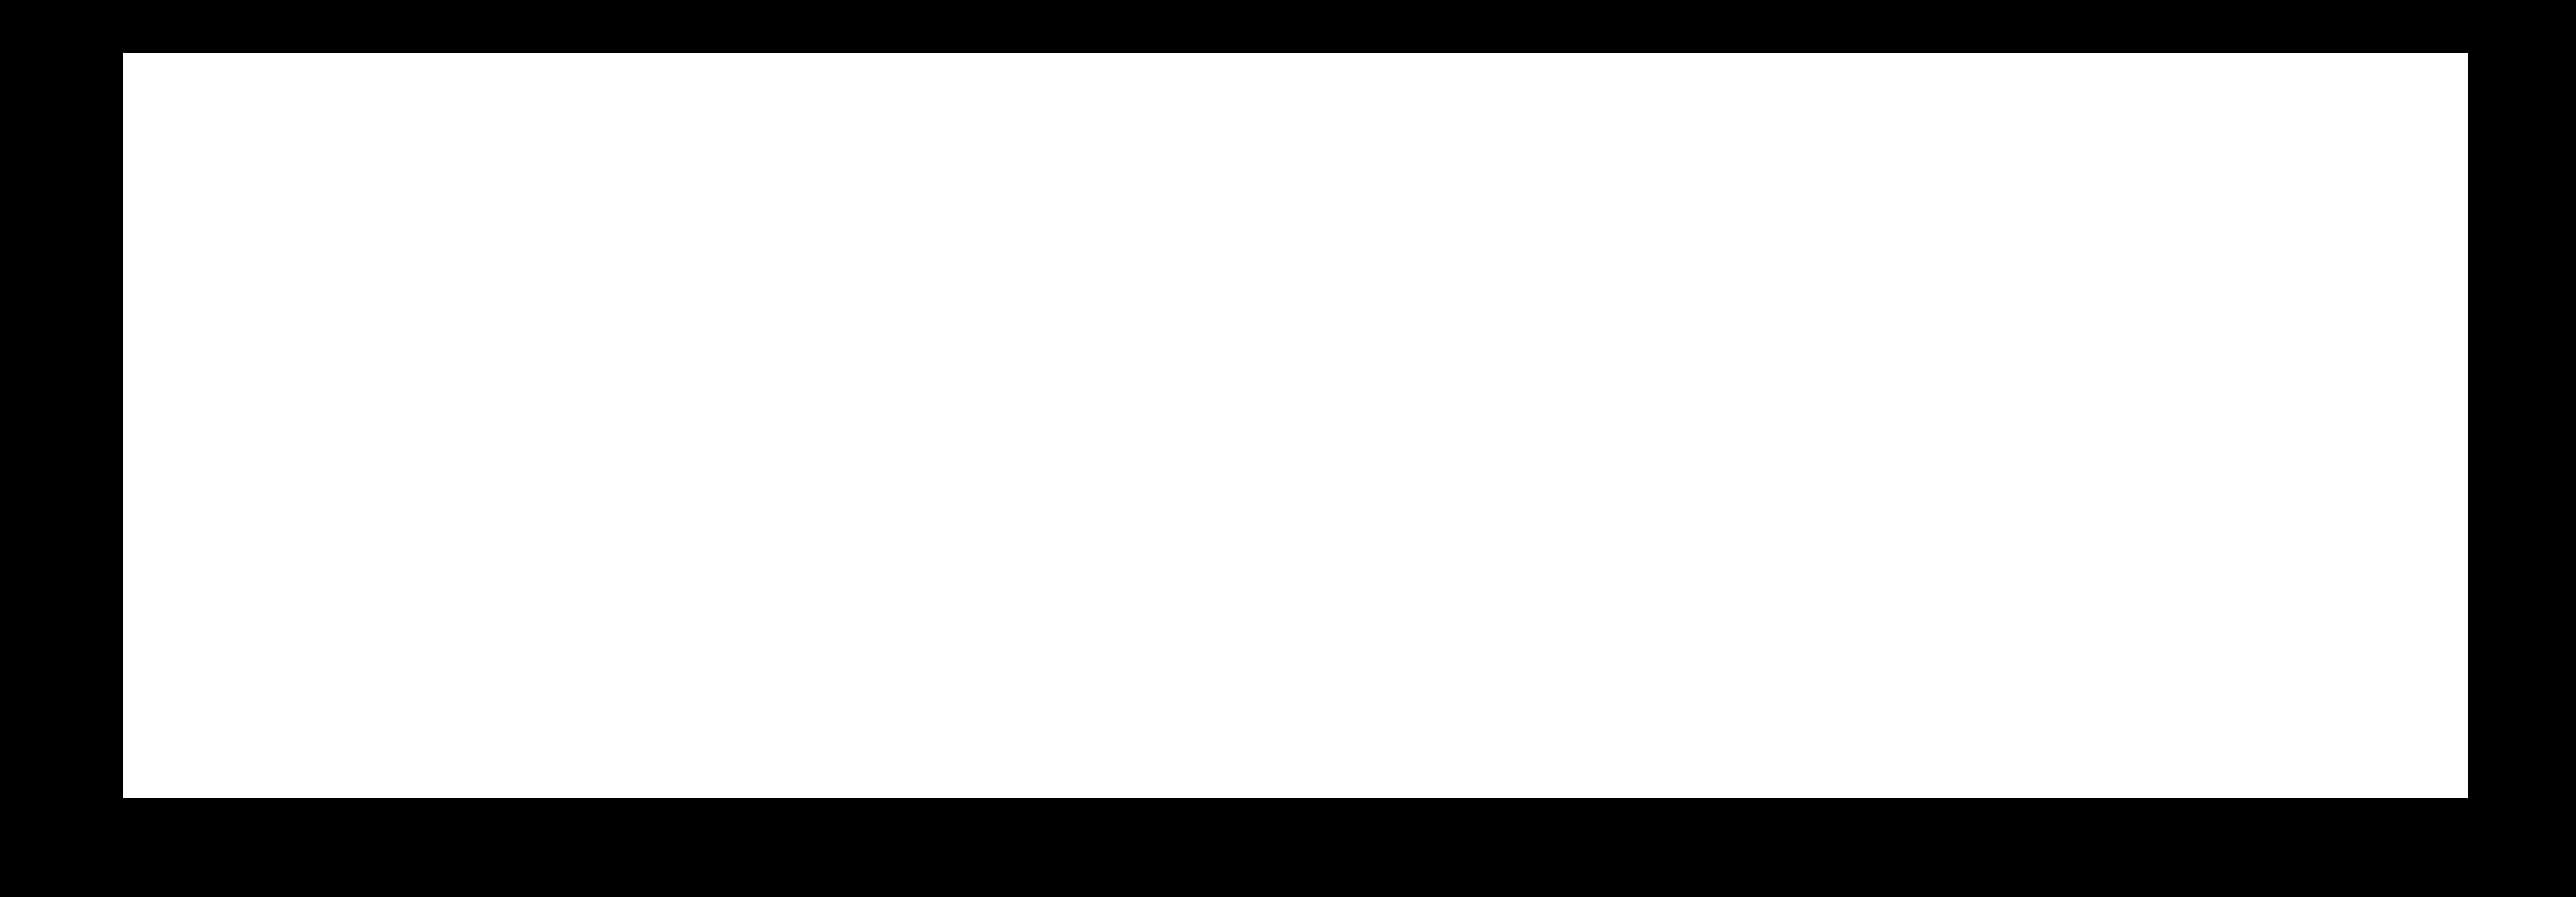 Michael Pellegrini Photography - Freelance Photographer